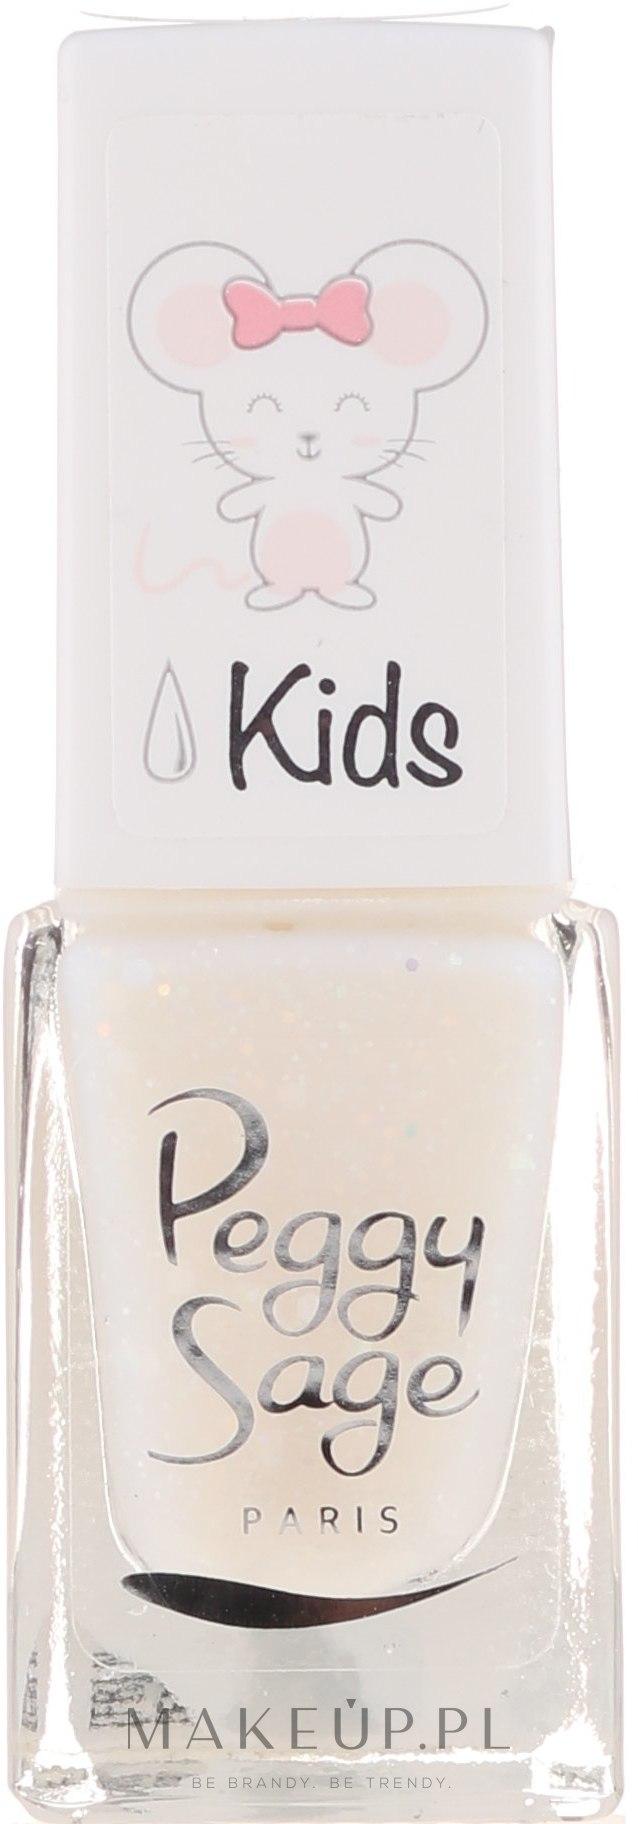 Lakier do paznokci - Peggy Sage Kids Nail Lacquer — фото Bianca